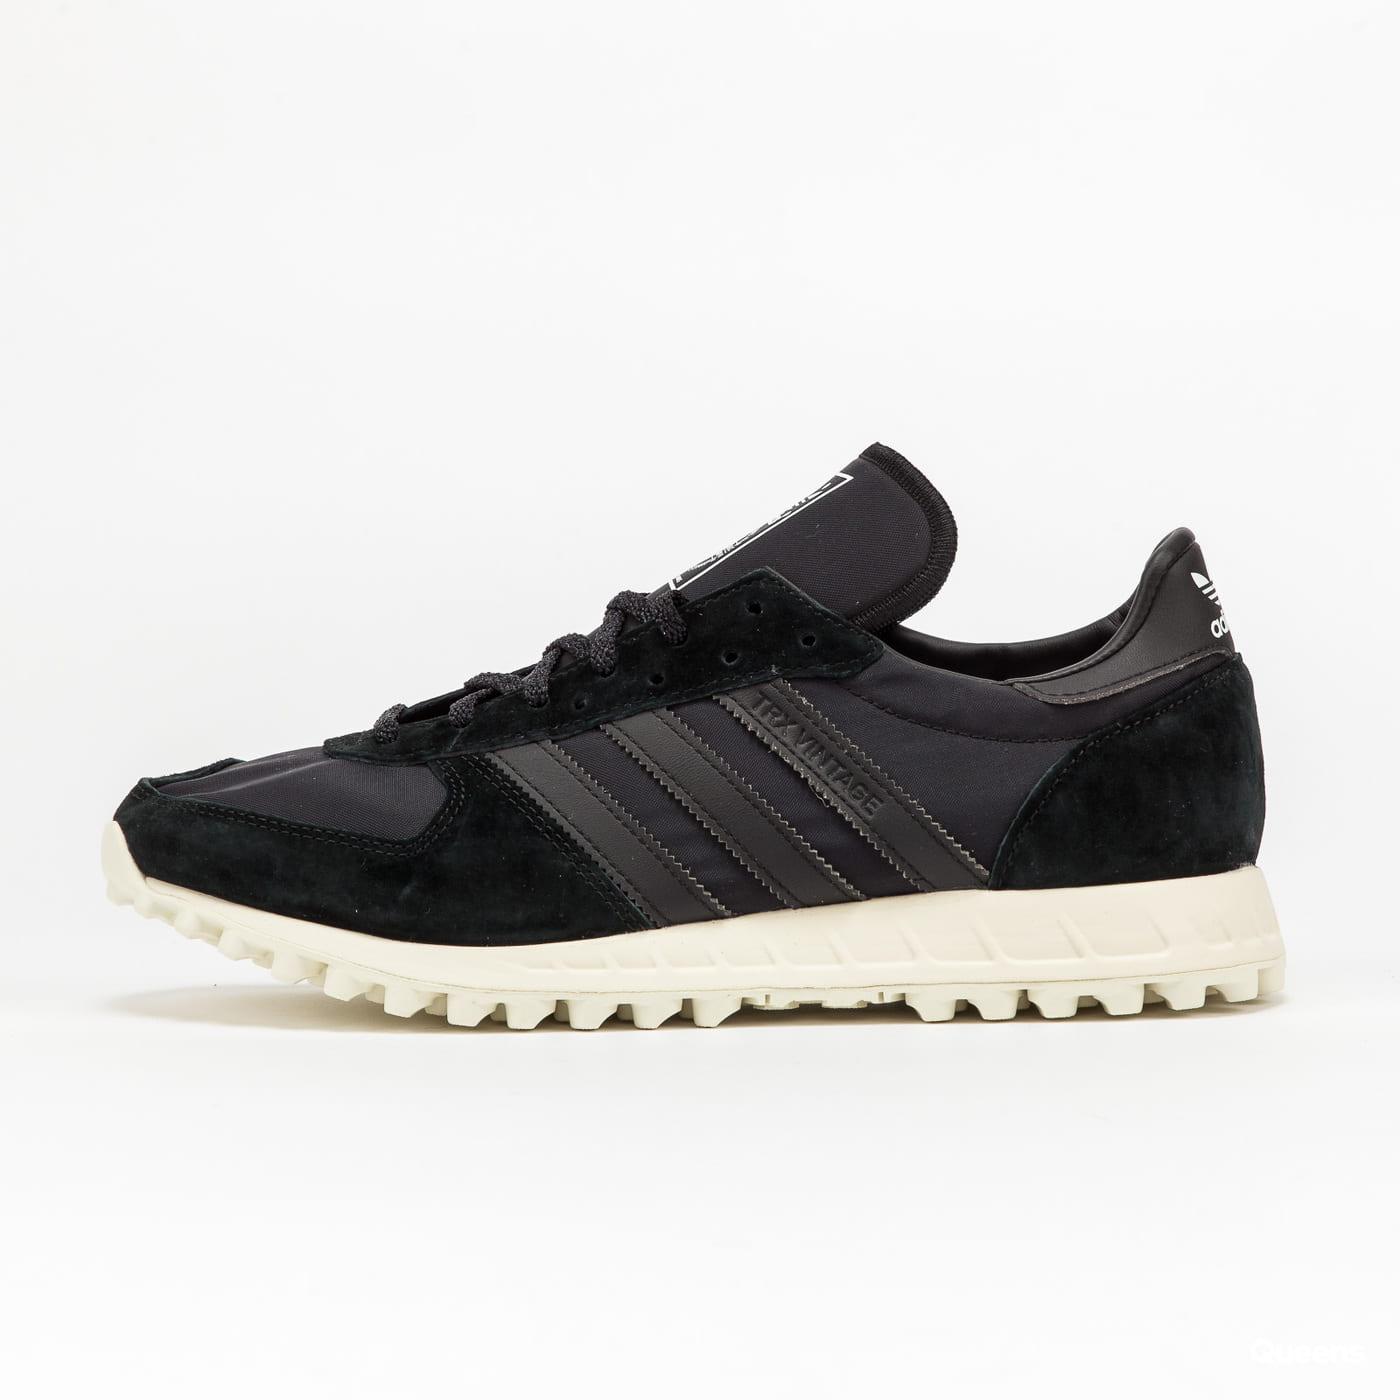 adidas Originals Adidas TRX Vintage owhite / cblack / ftwwht